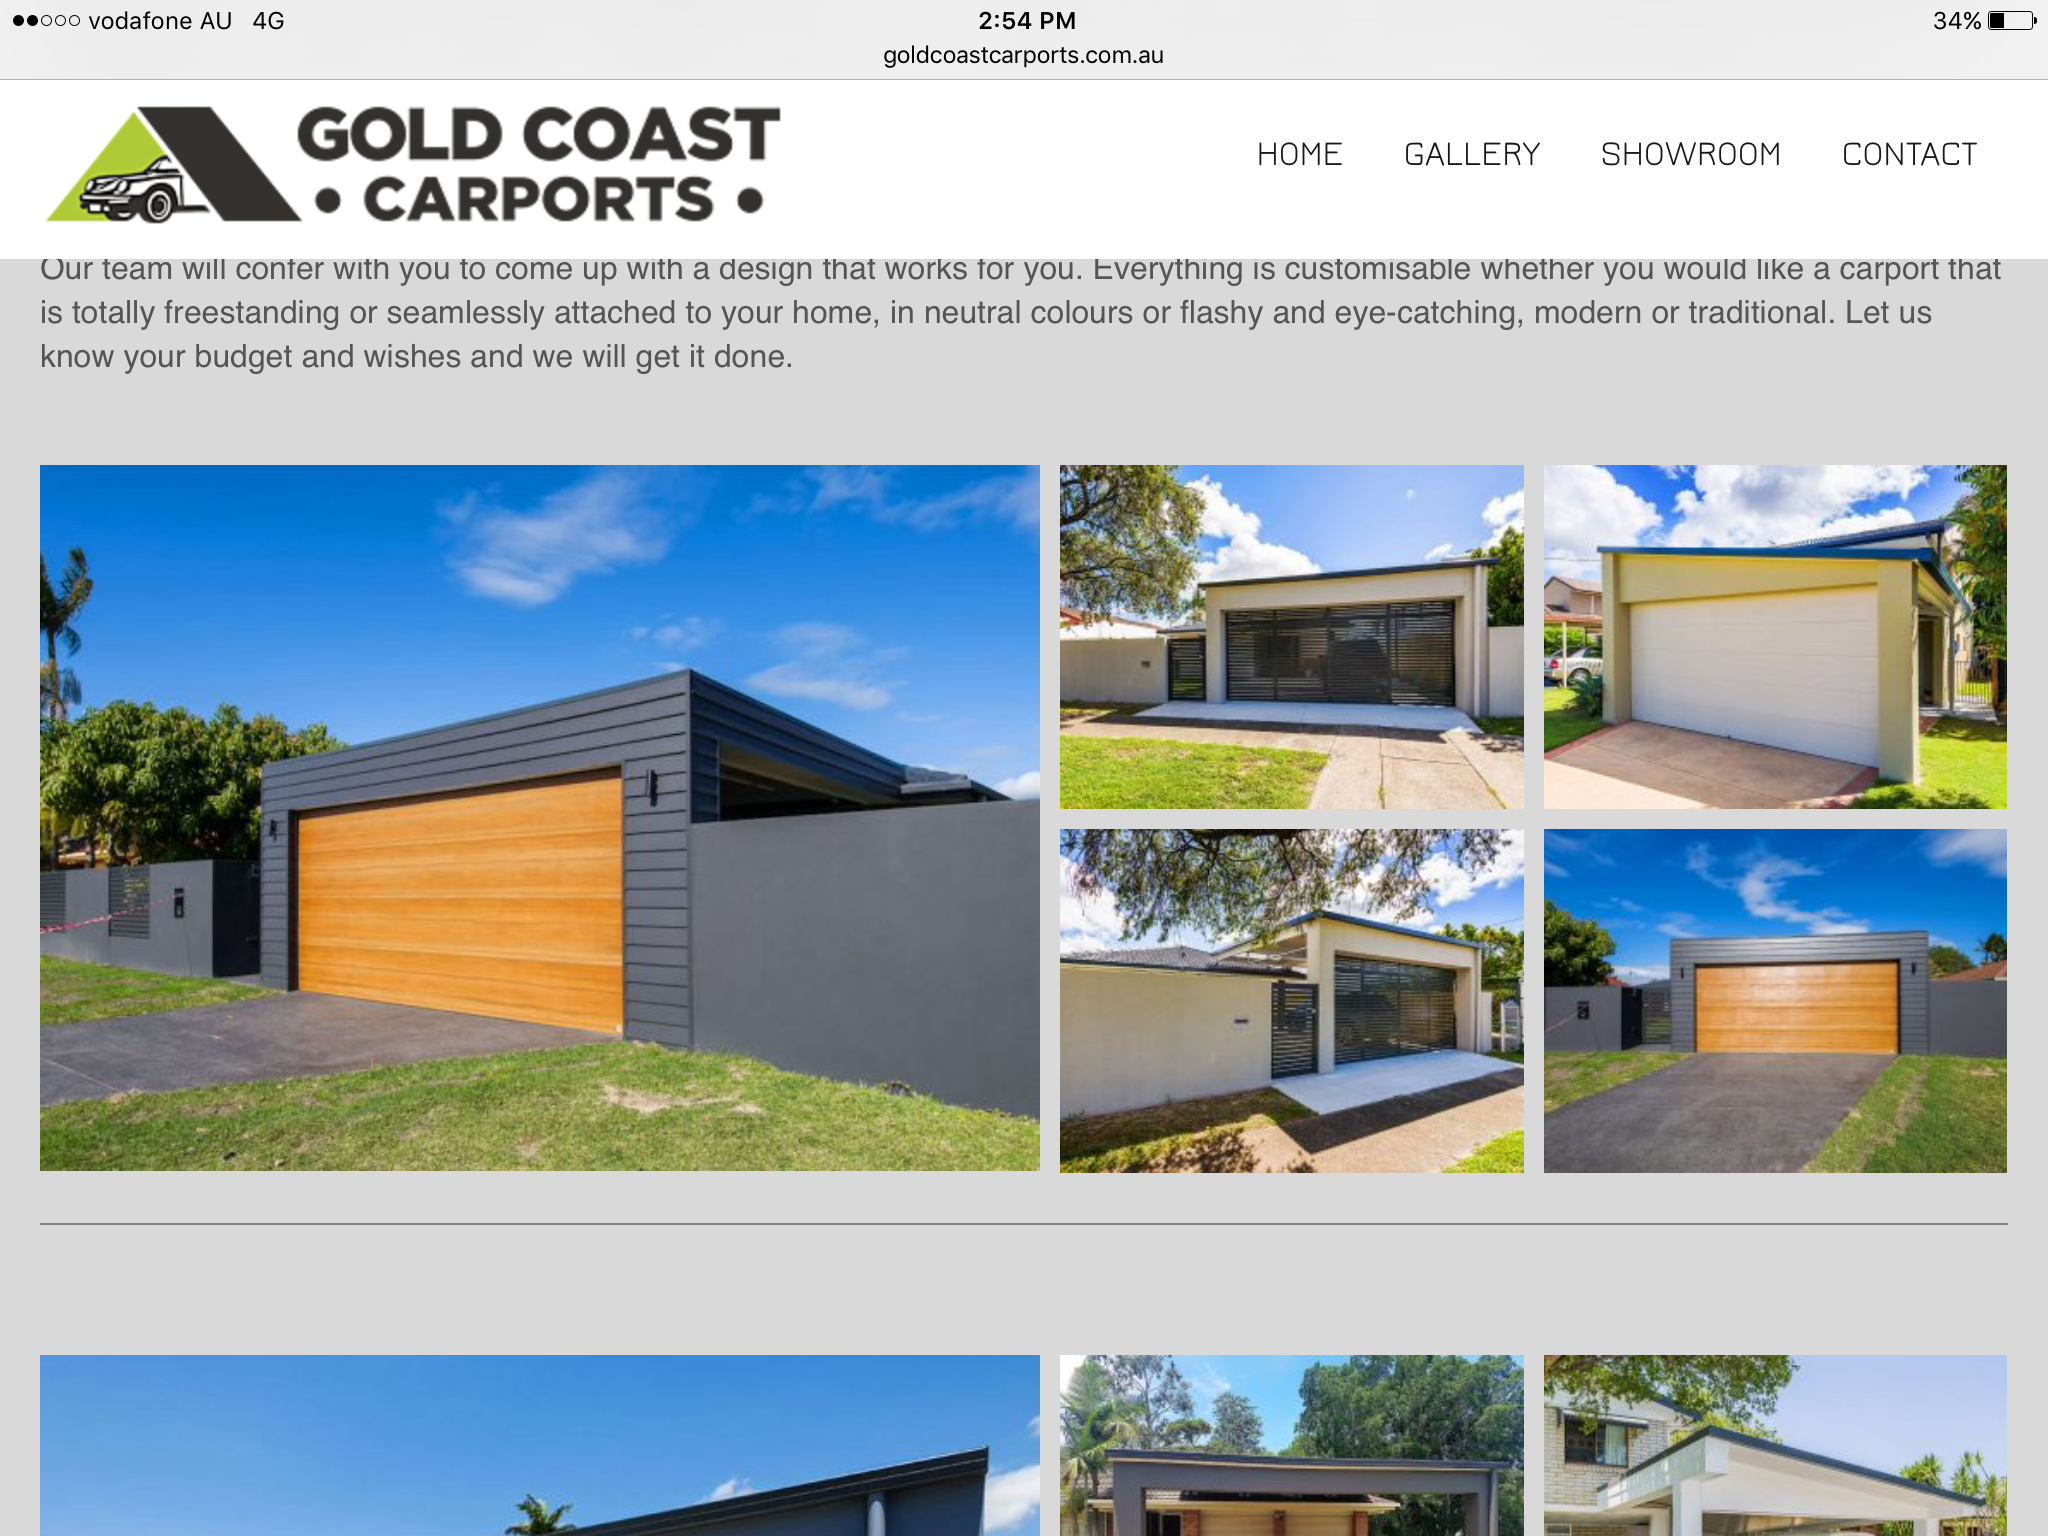 Pin by ellie davis on Carport Gold coast, Design, Home